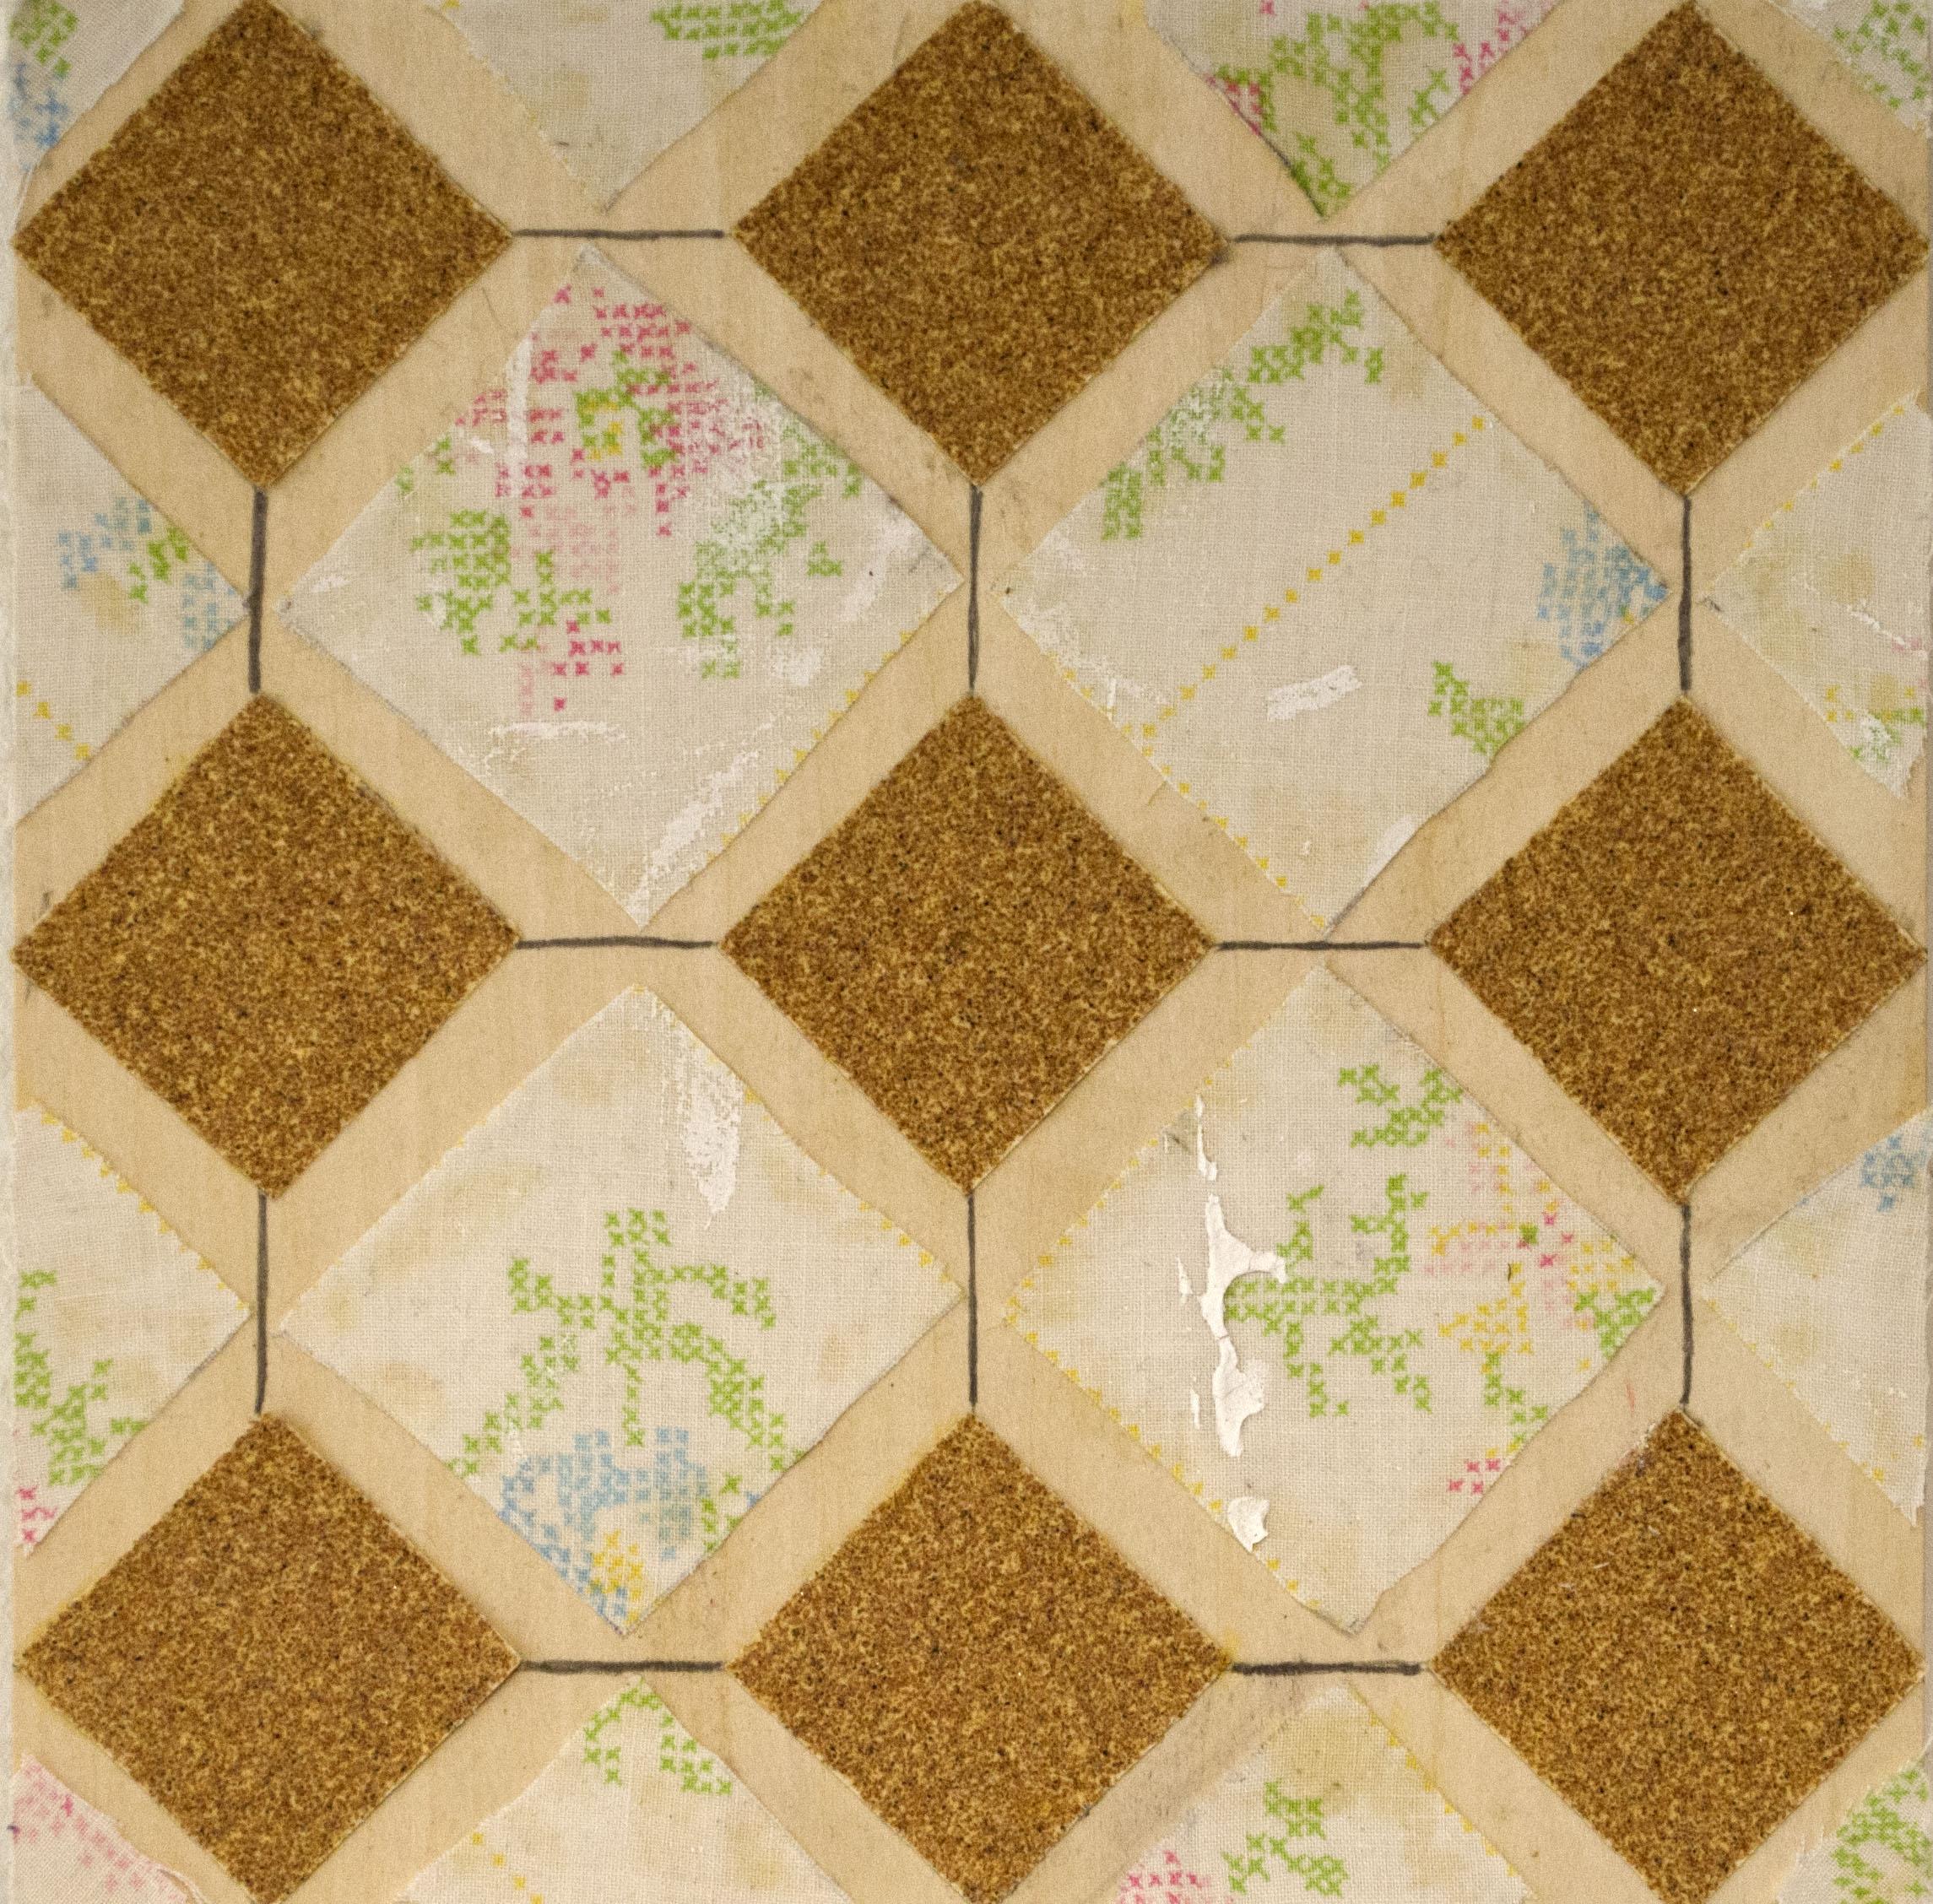 Sandpaper and Bedsheet/Dropcloth Tile